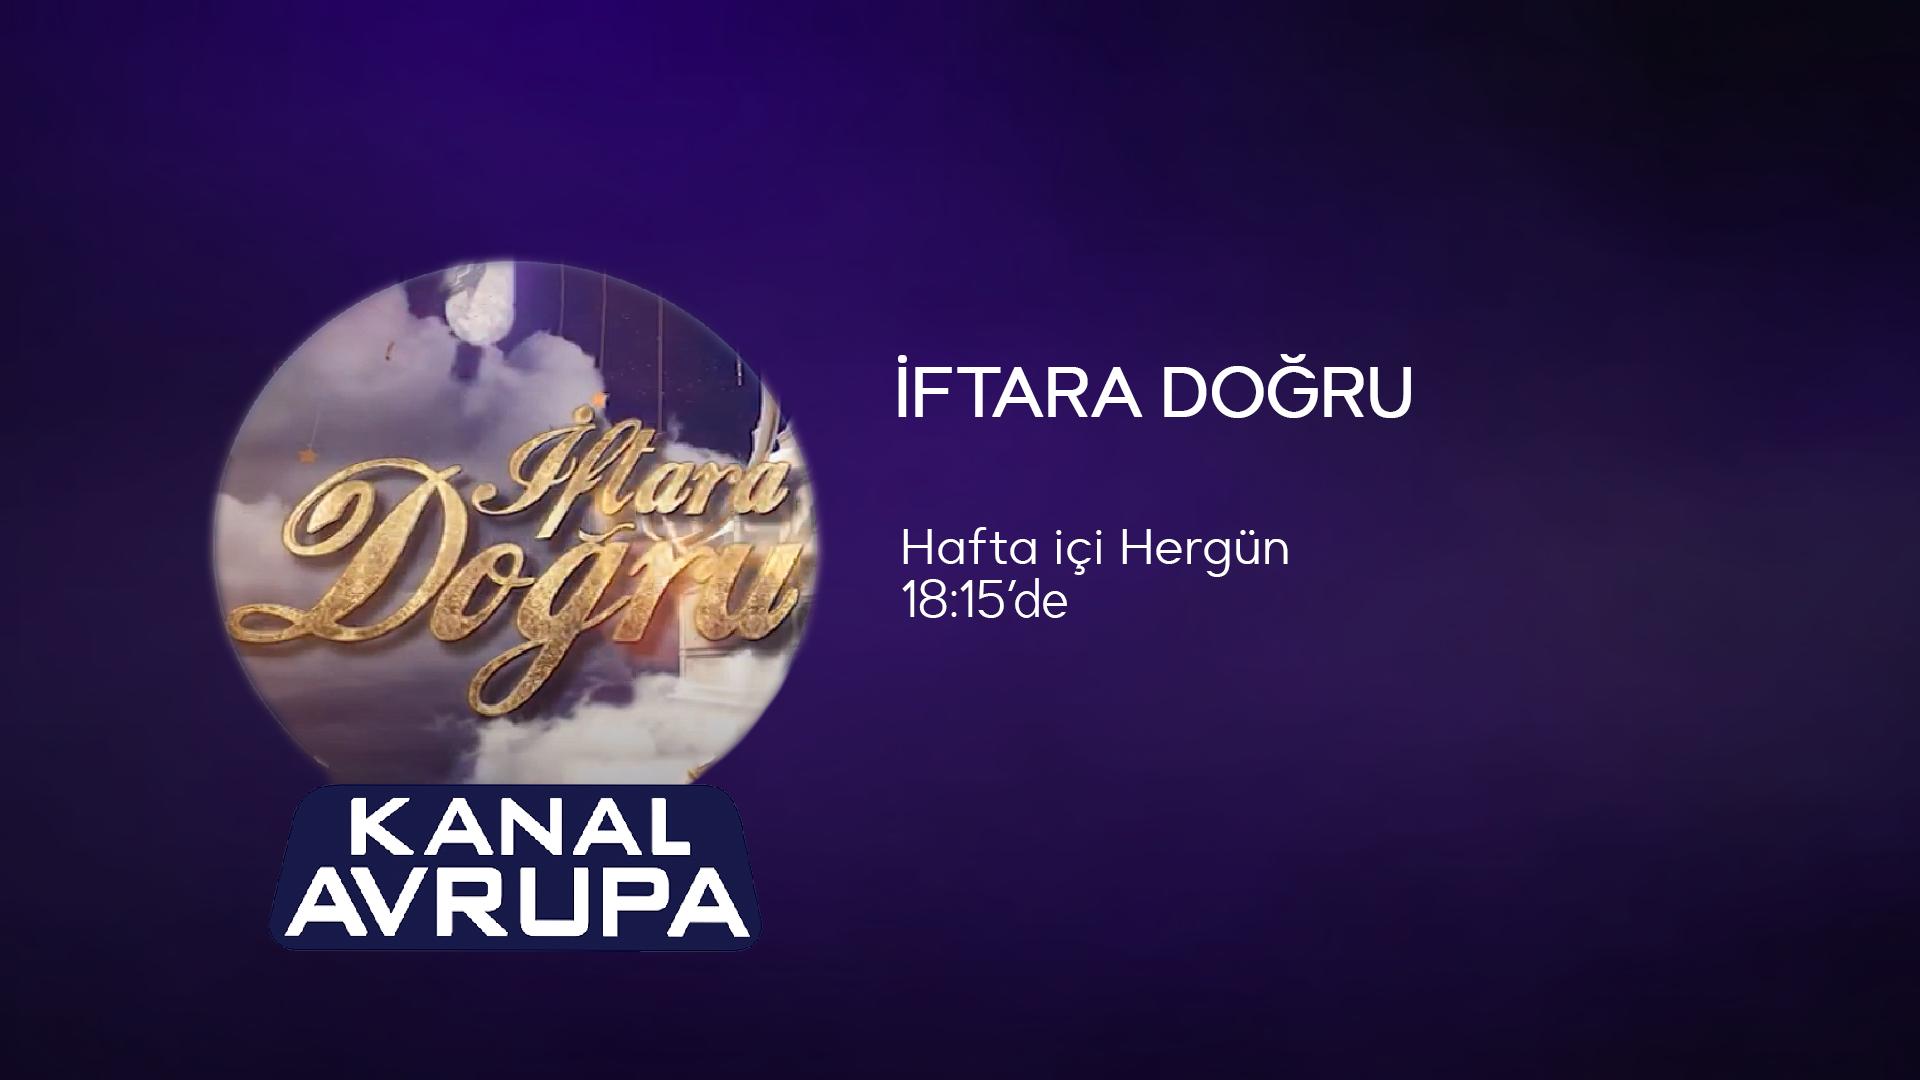 IFTARA_DOGRU